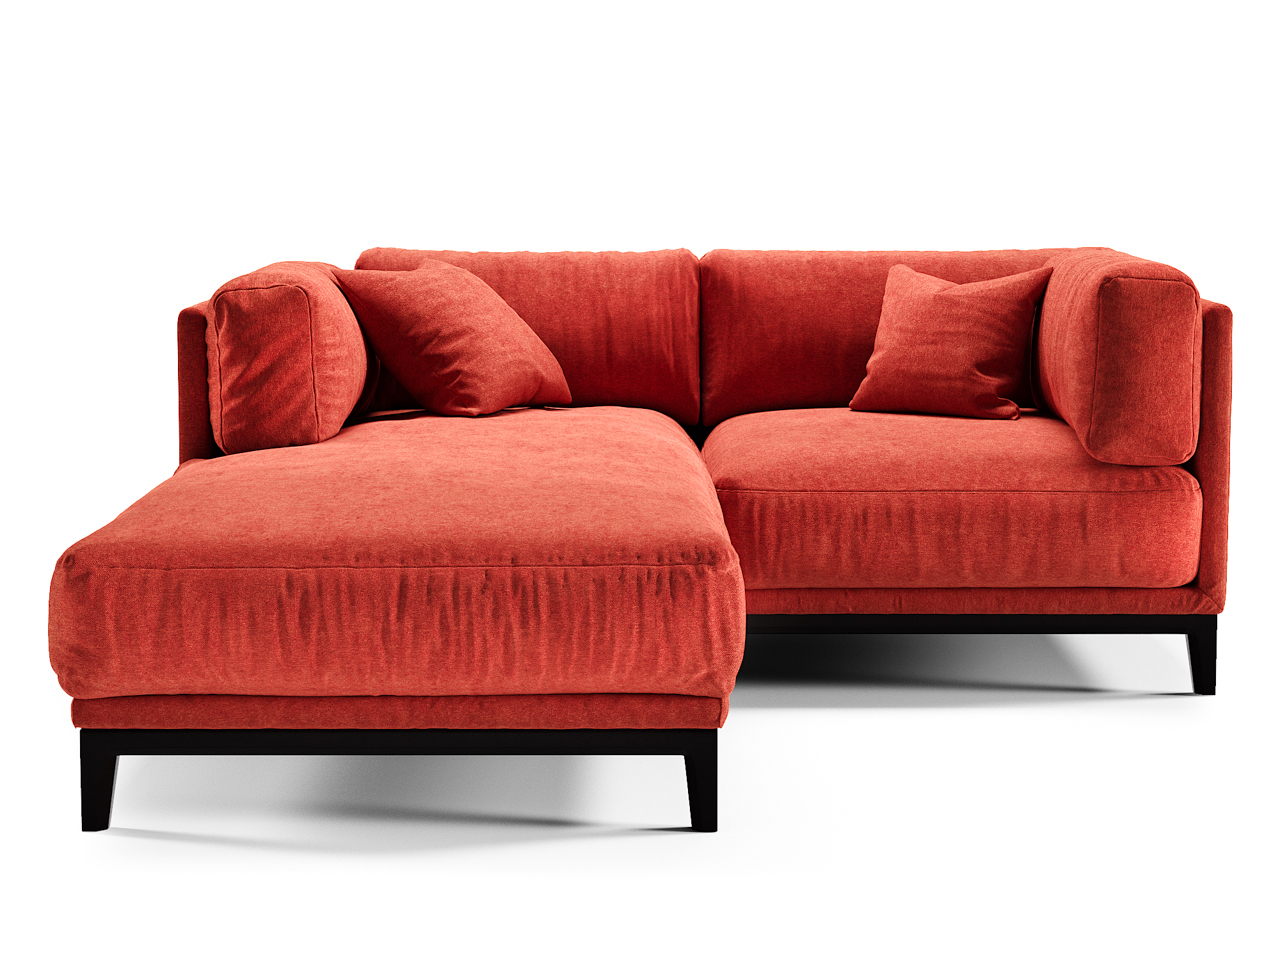 The idea диван case красный 108288/5